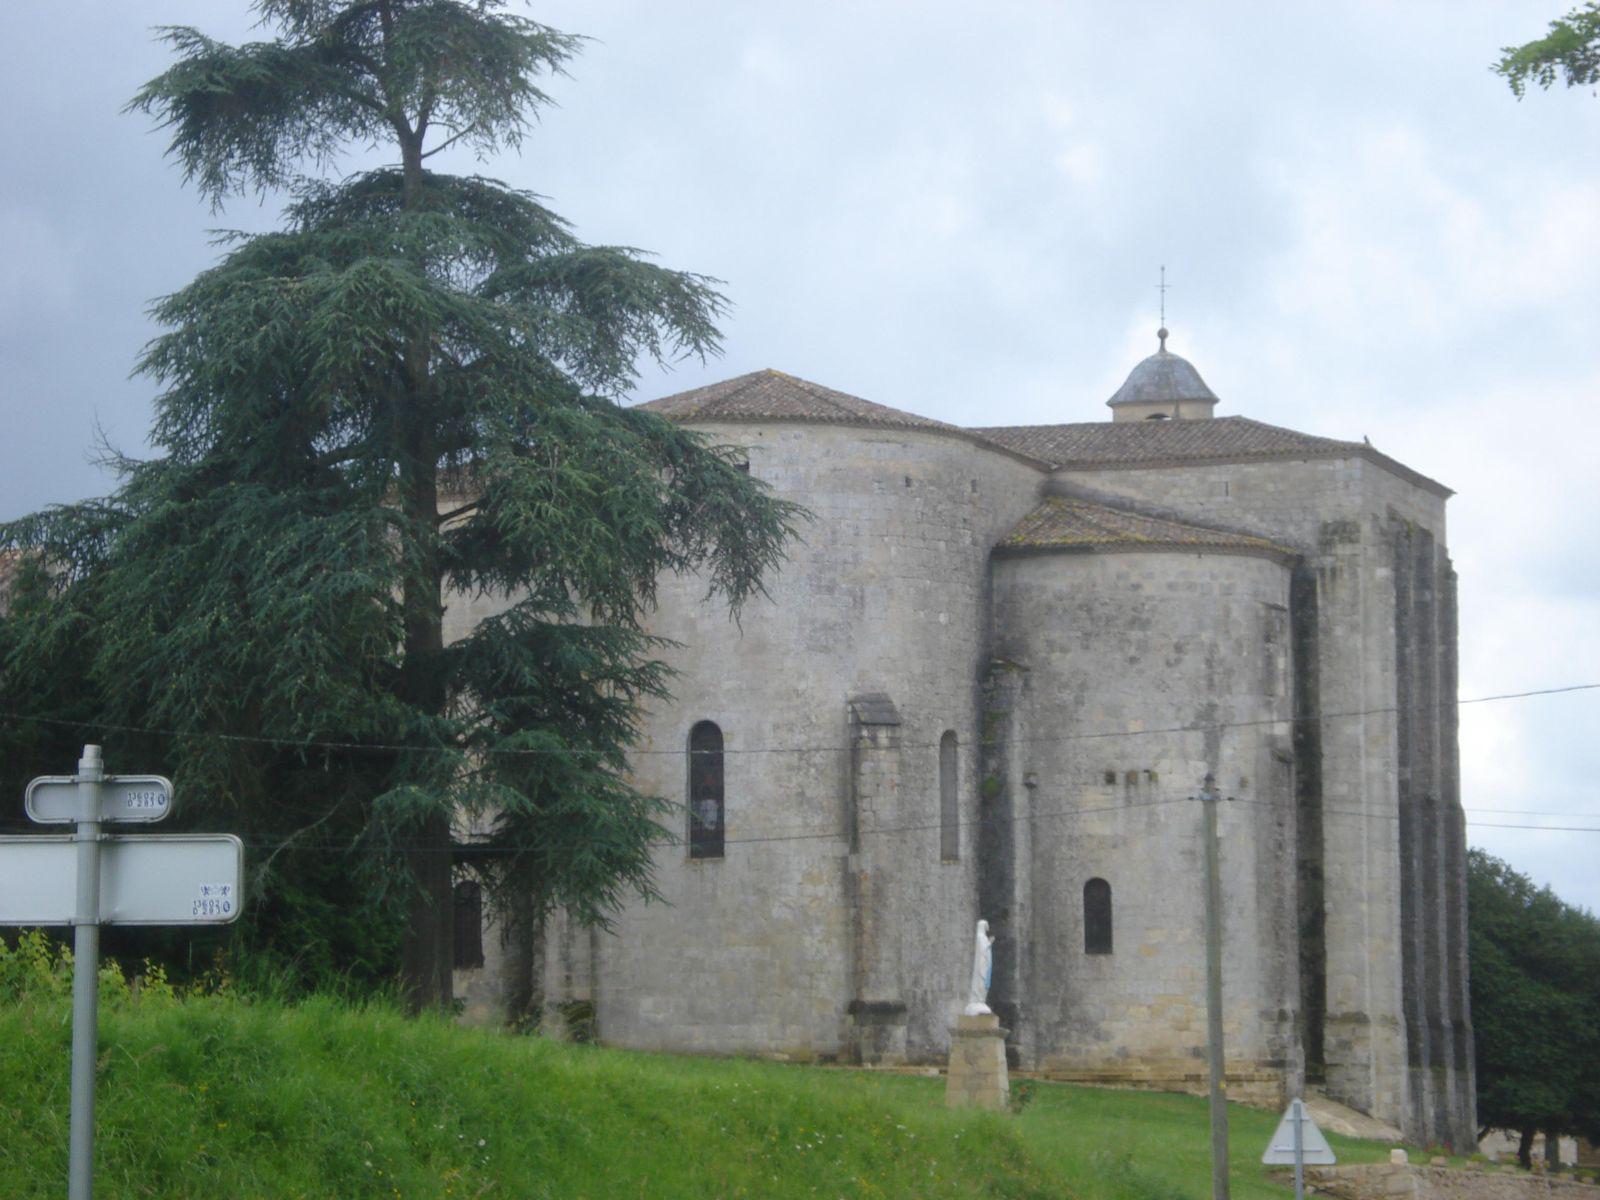 Image : Abbaye de Saint-Ferme